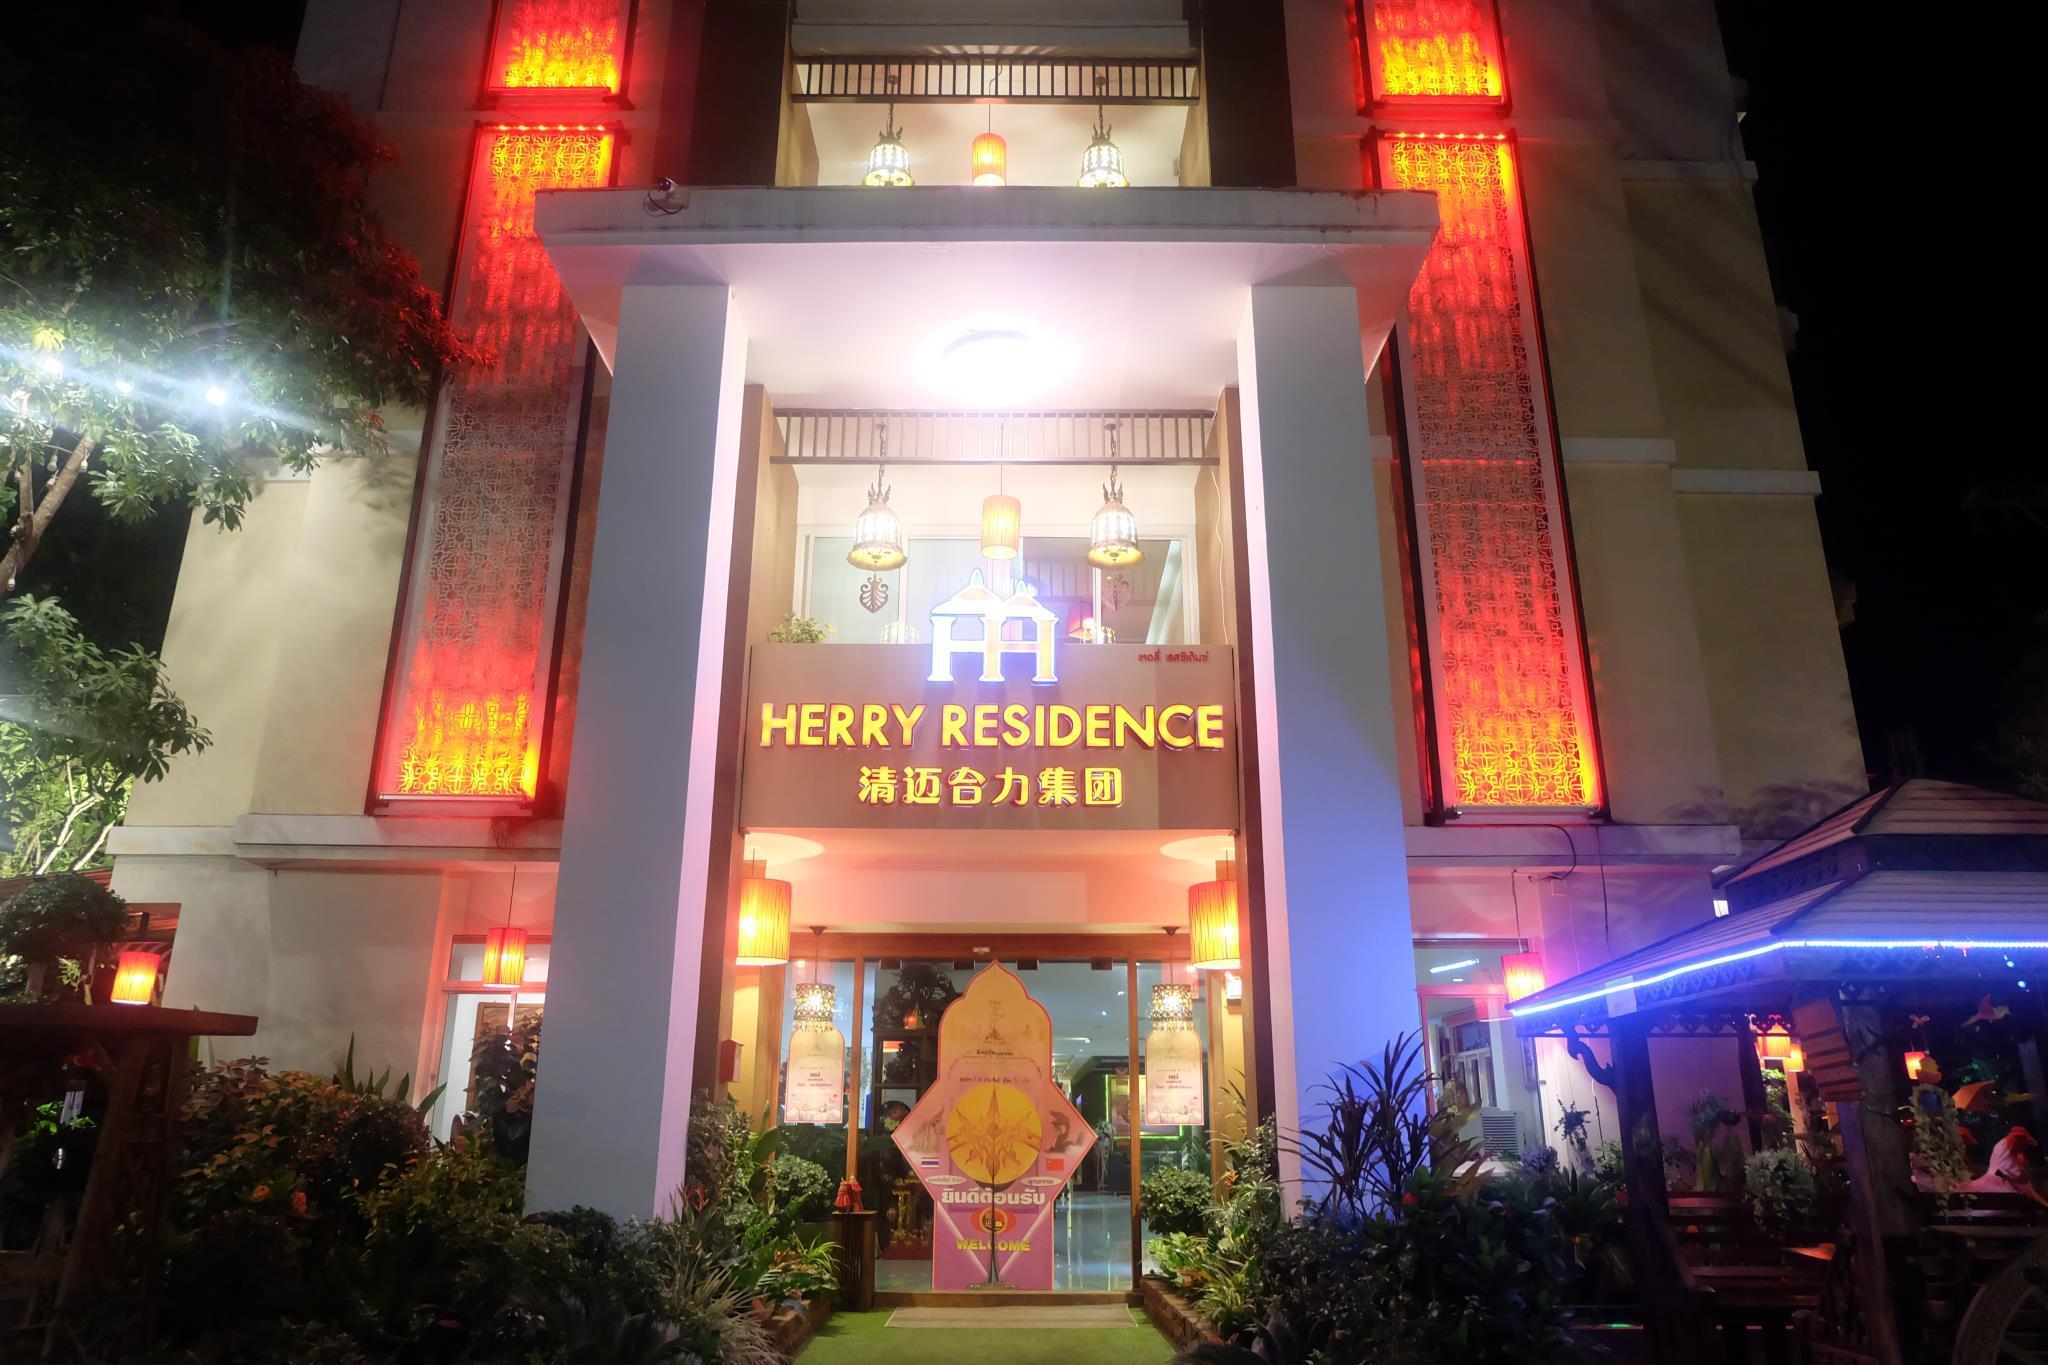 Herry Residence